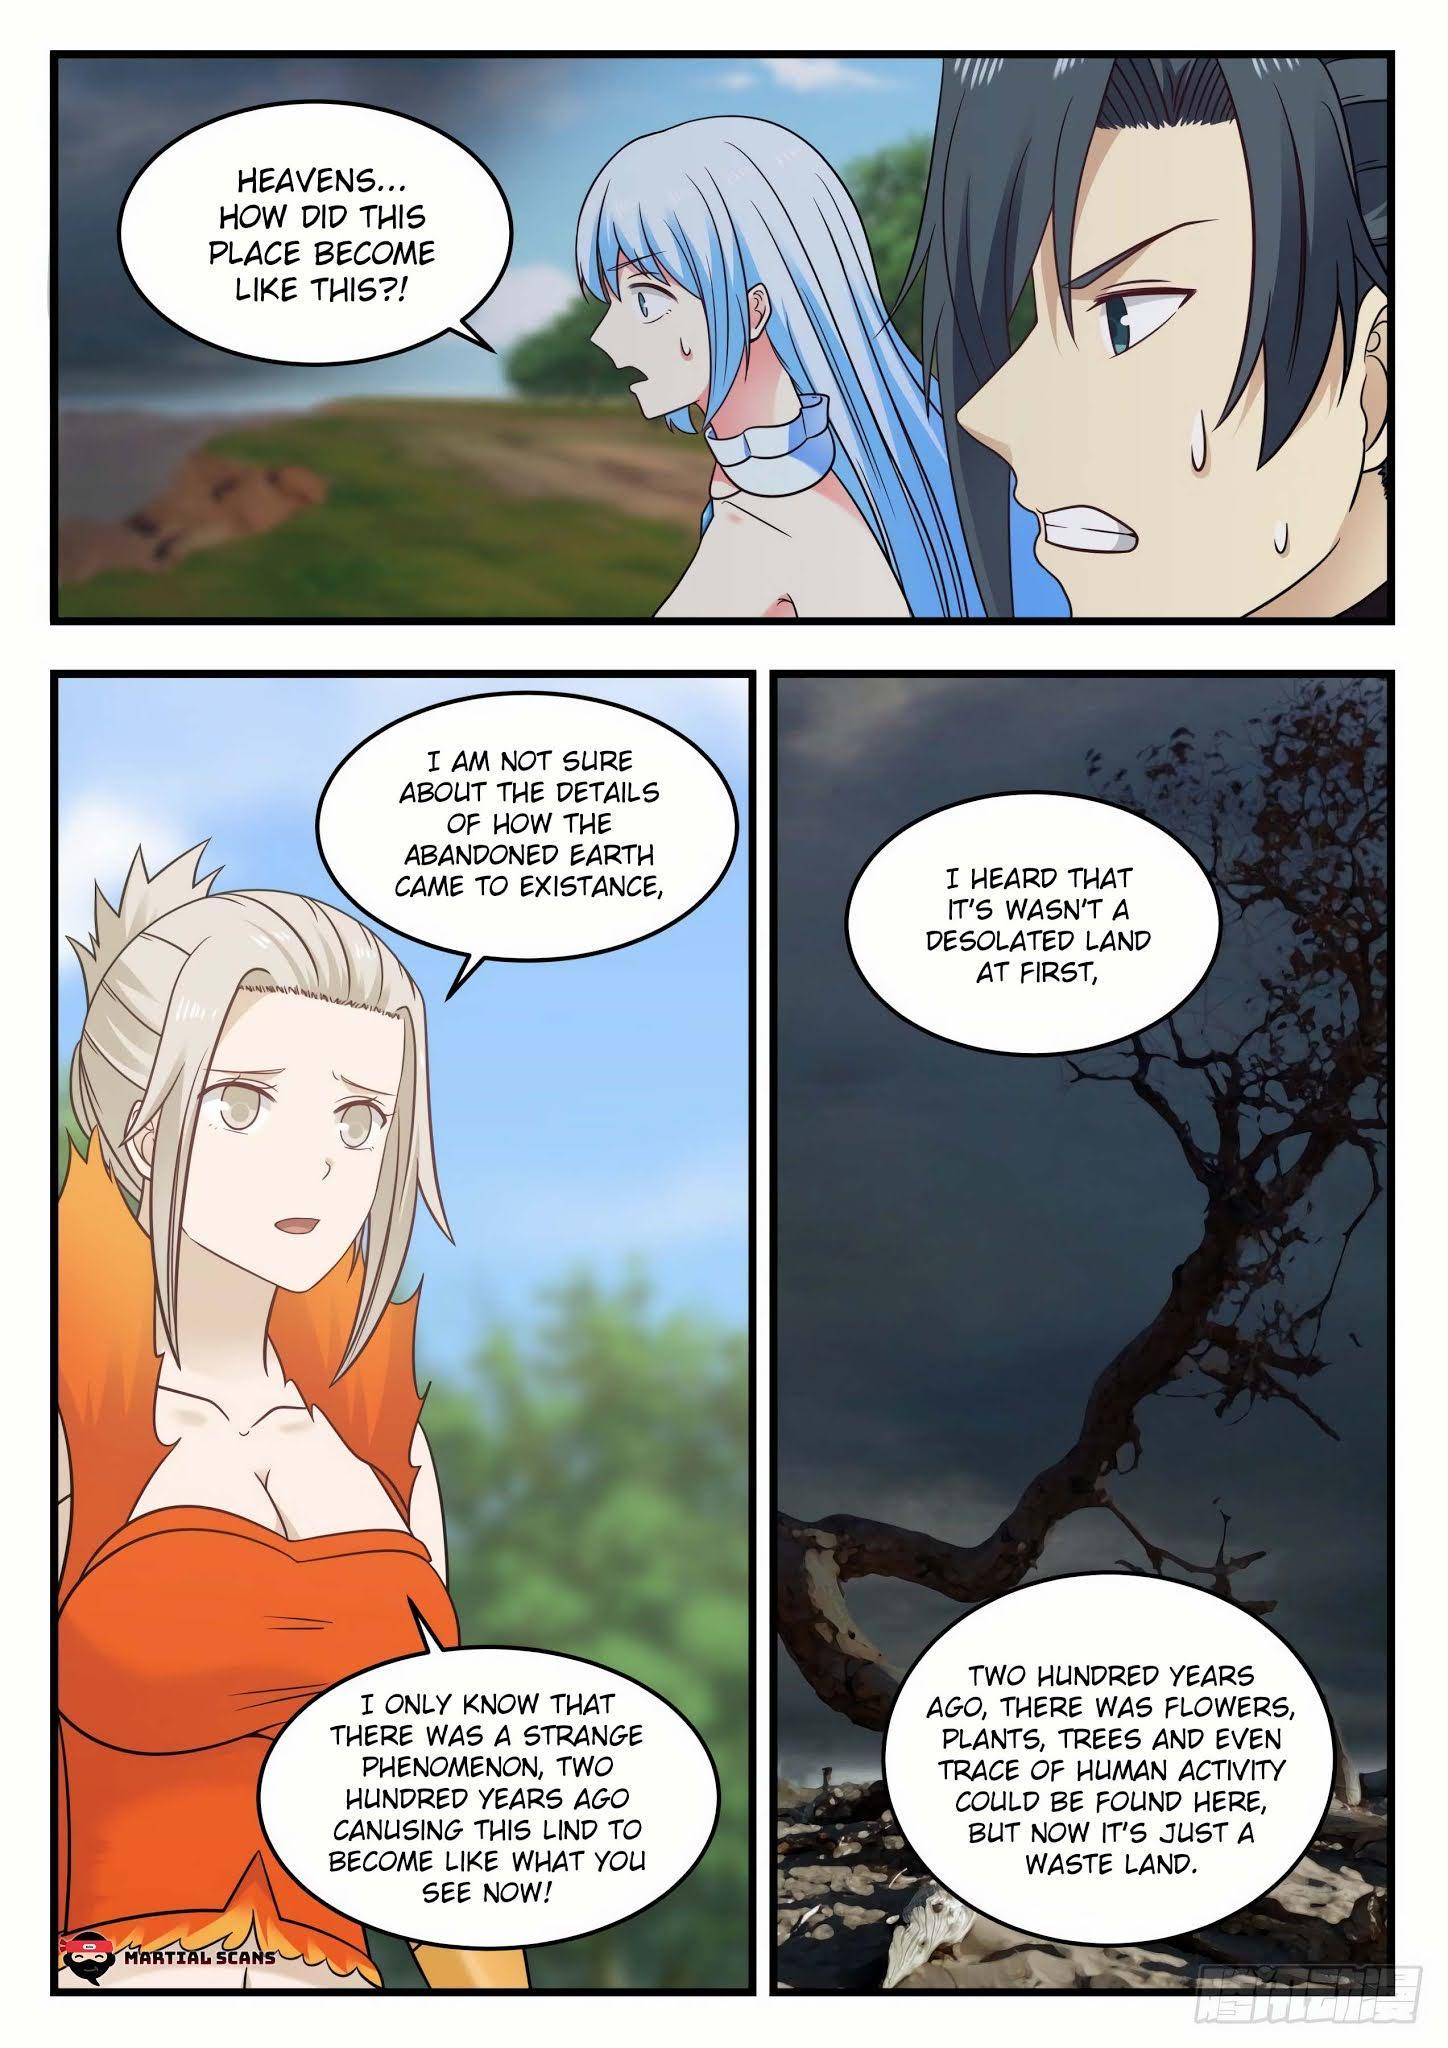 Martial Peak Chapter 583 - Abandoned Earth page 11 - Mangakakalots.com